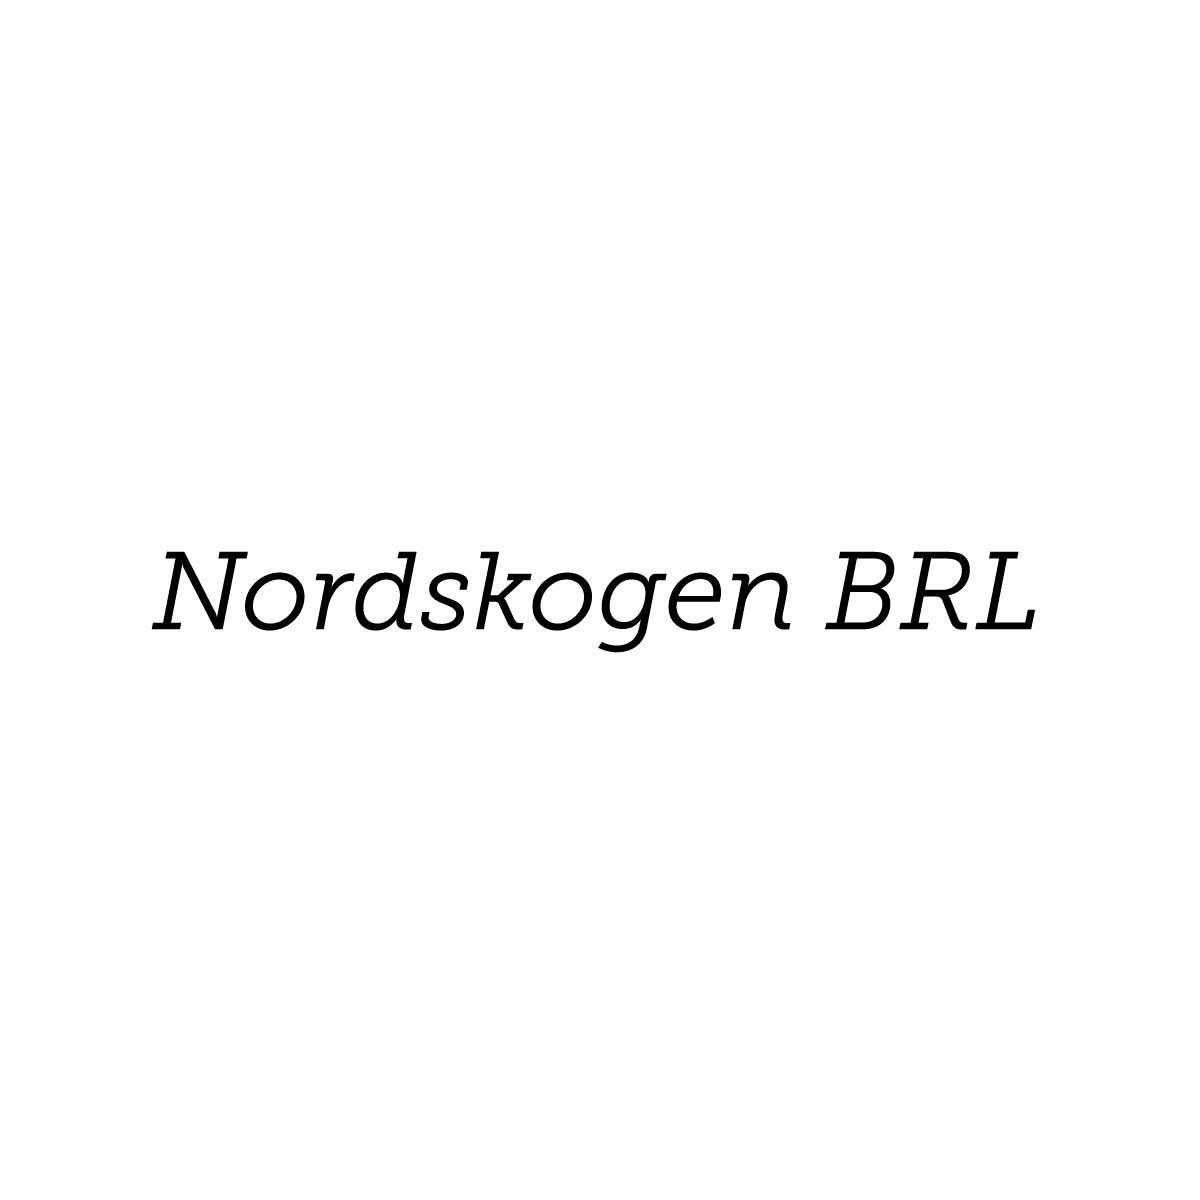 Nordskogen BRL